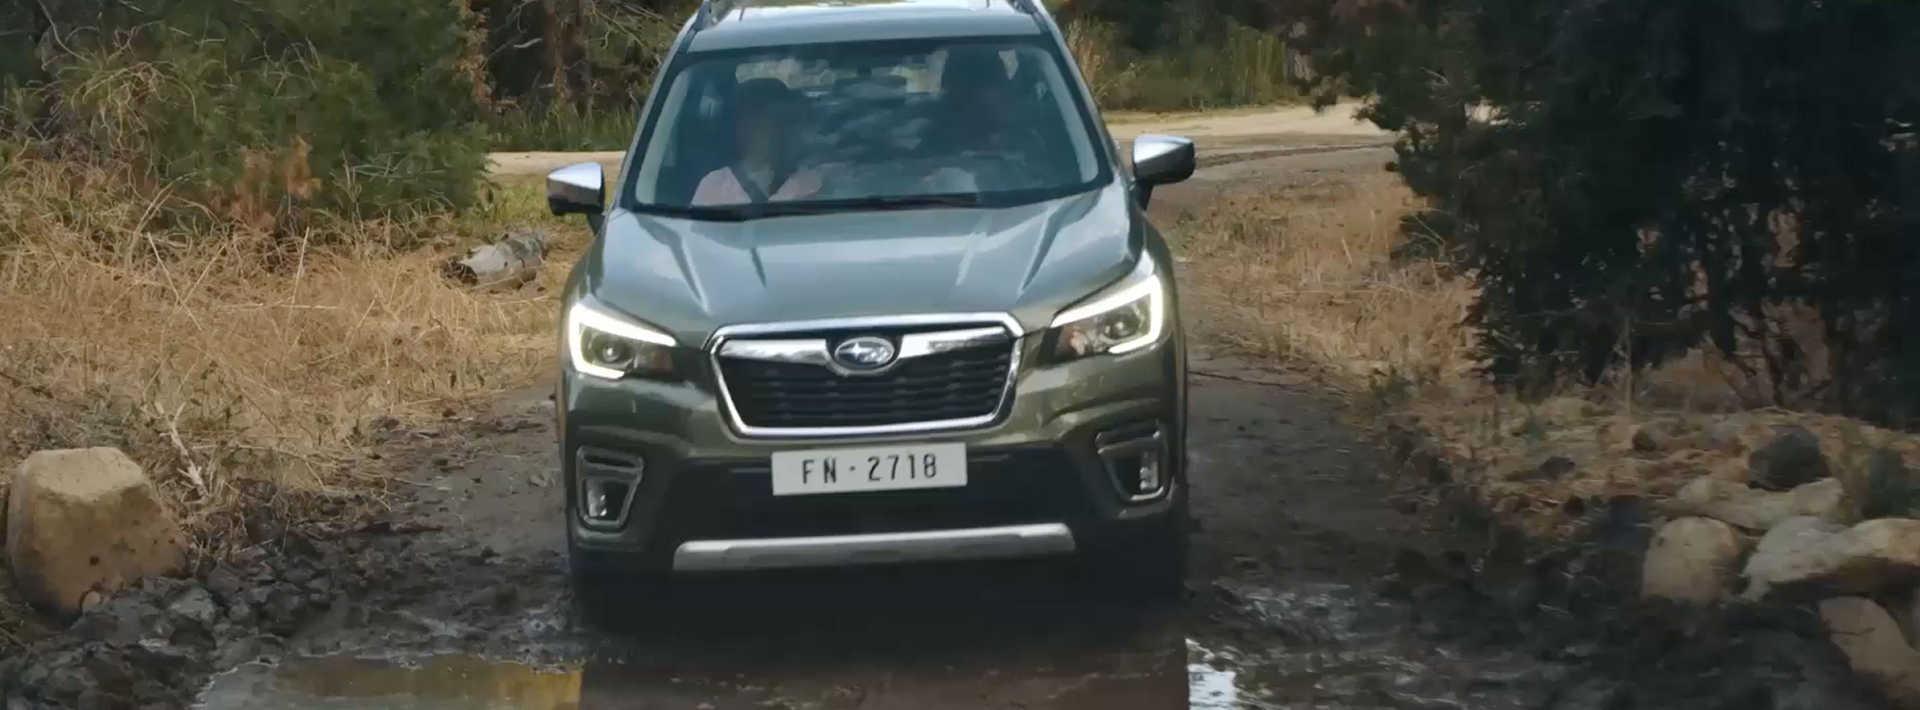 Experience the Performance of the 2019 Subaru Forester | Subaru